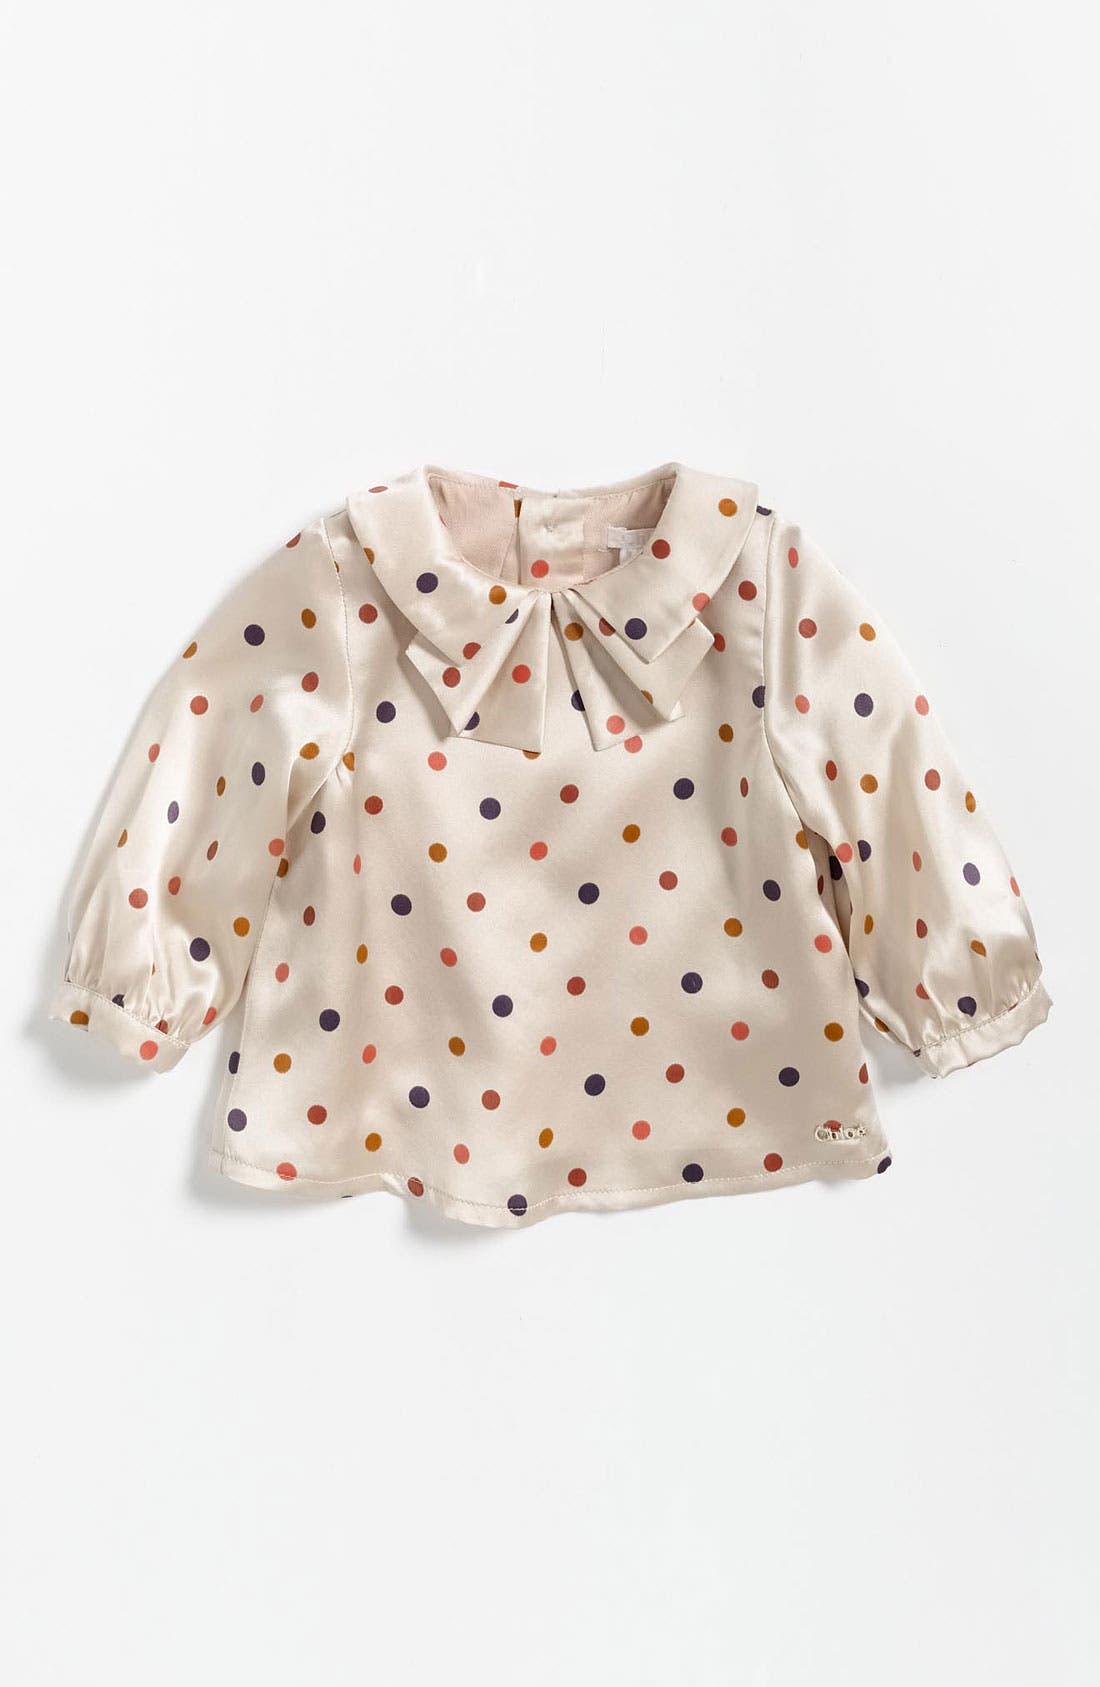 Alternate Image 1 Selected - Chloé Polka Dot Blouse (Infant)